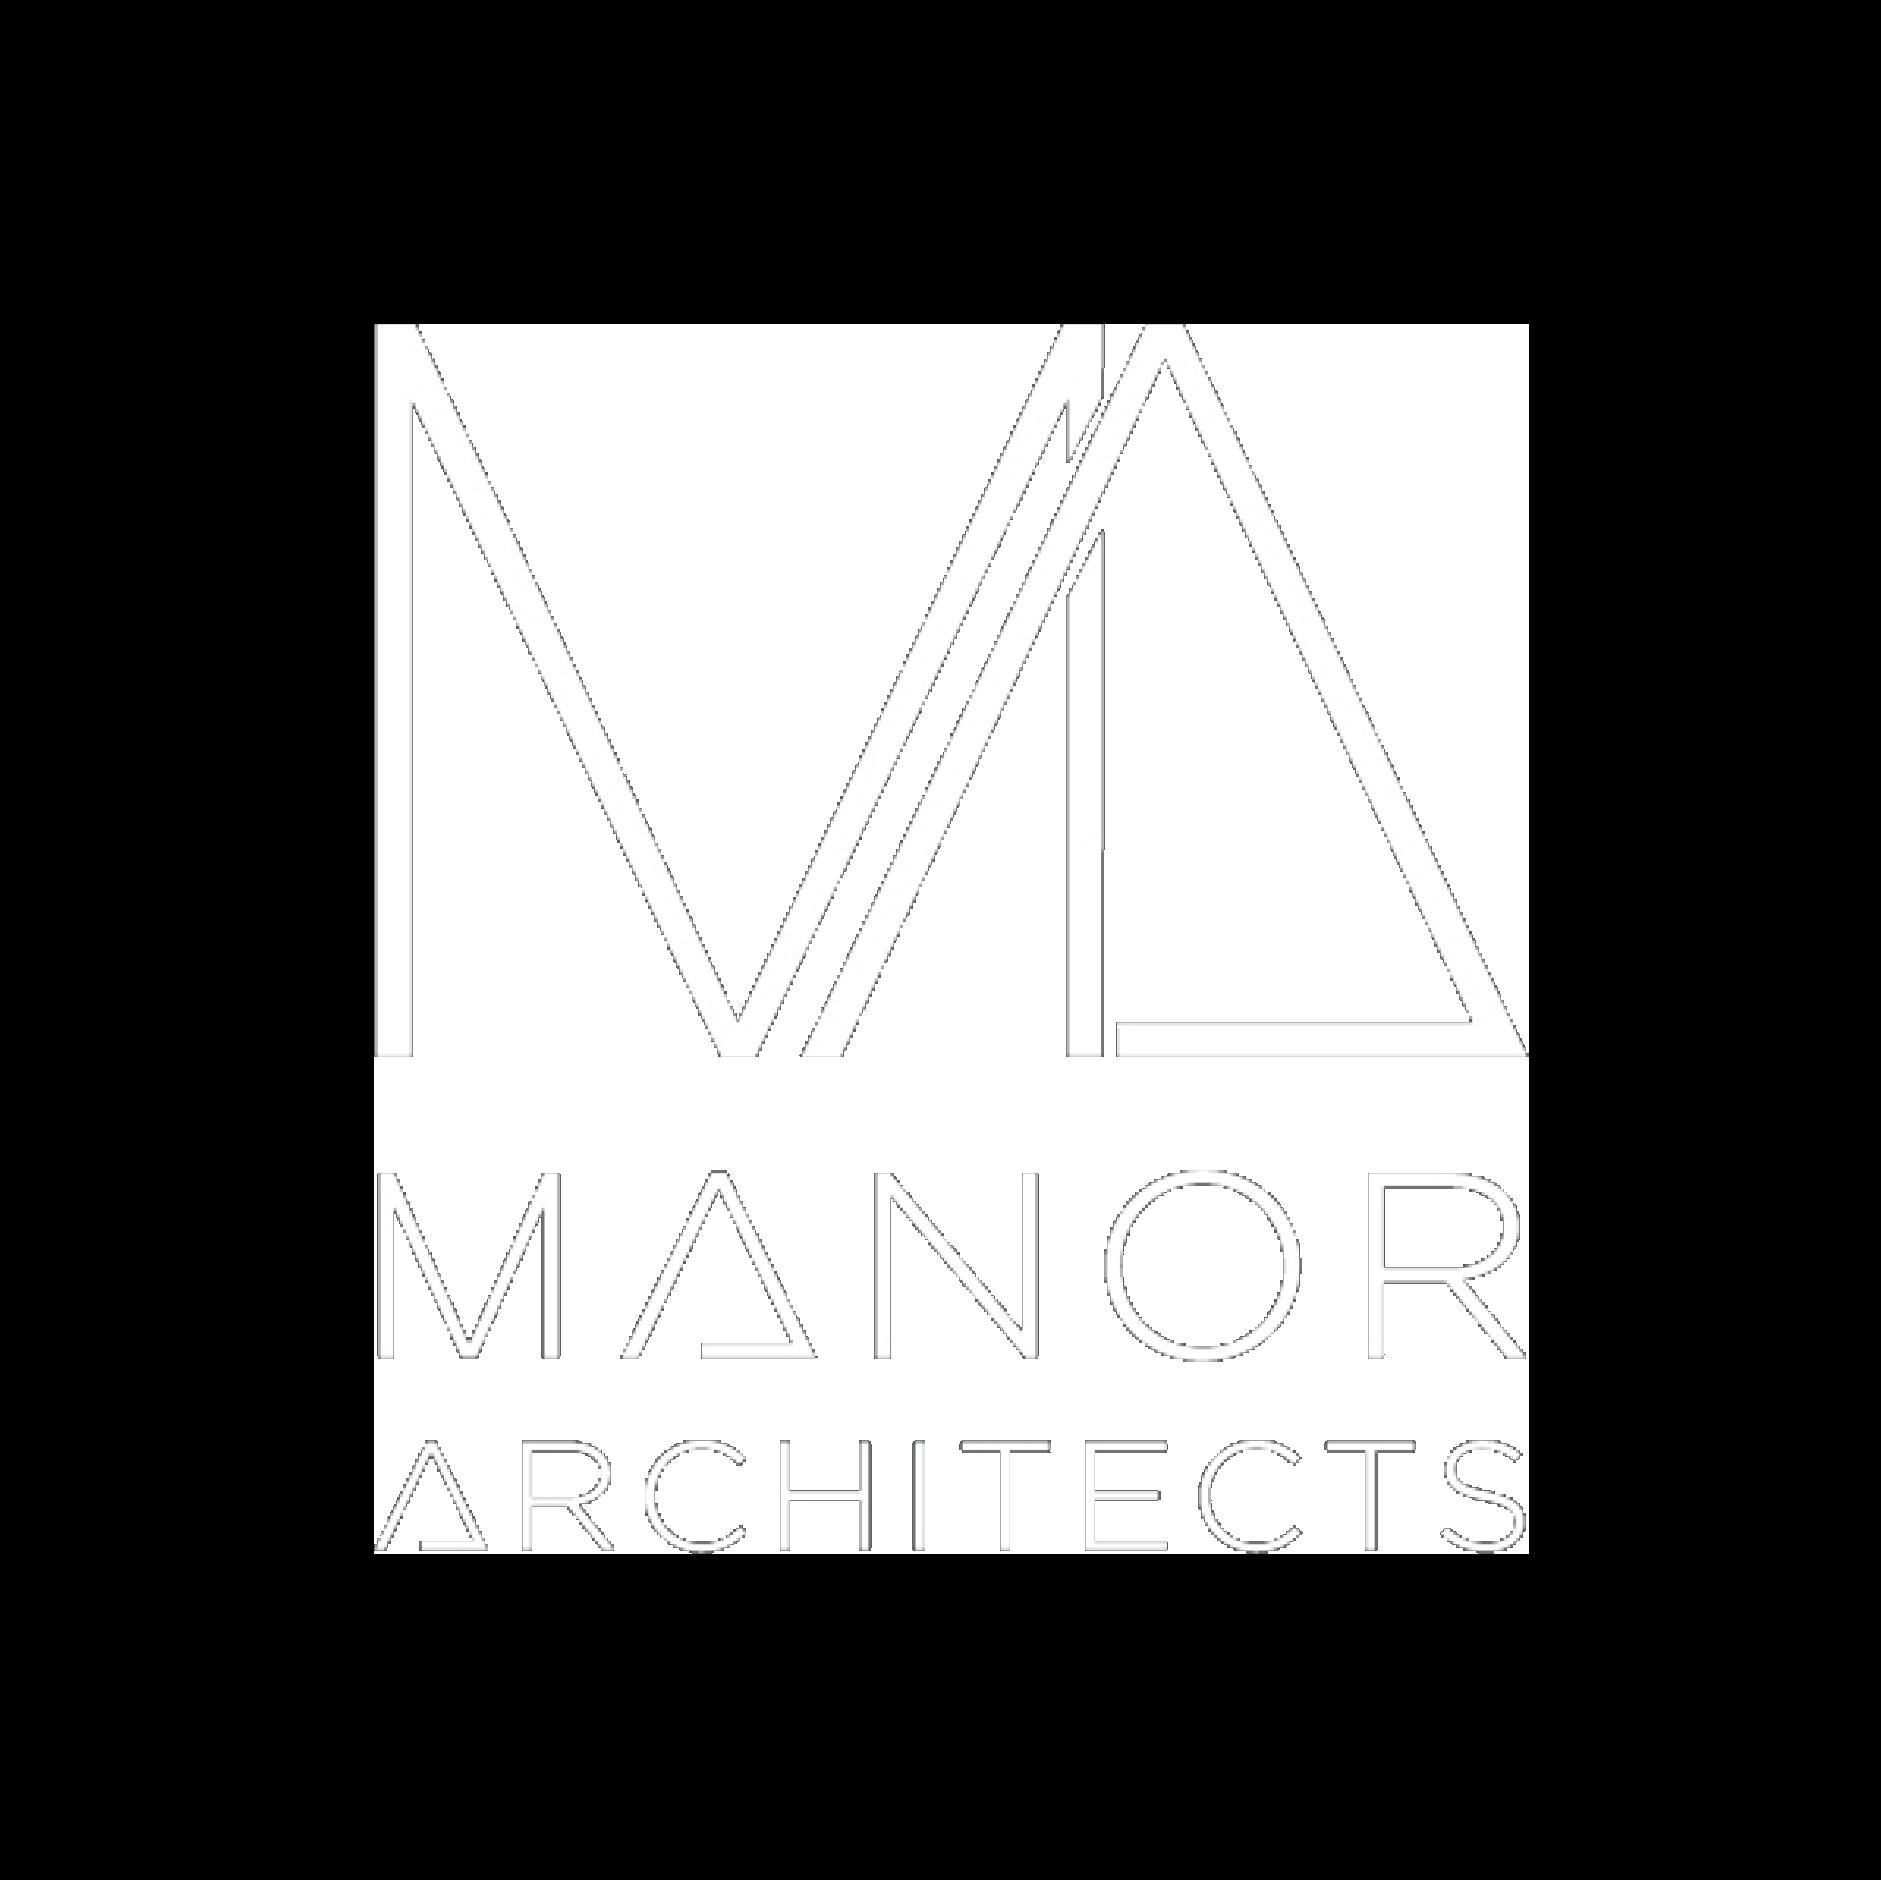 Manor Architects